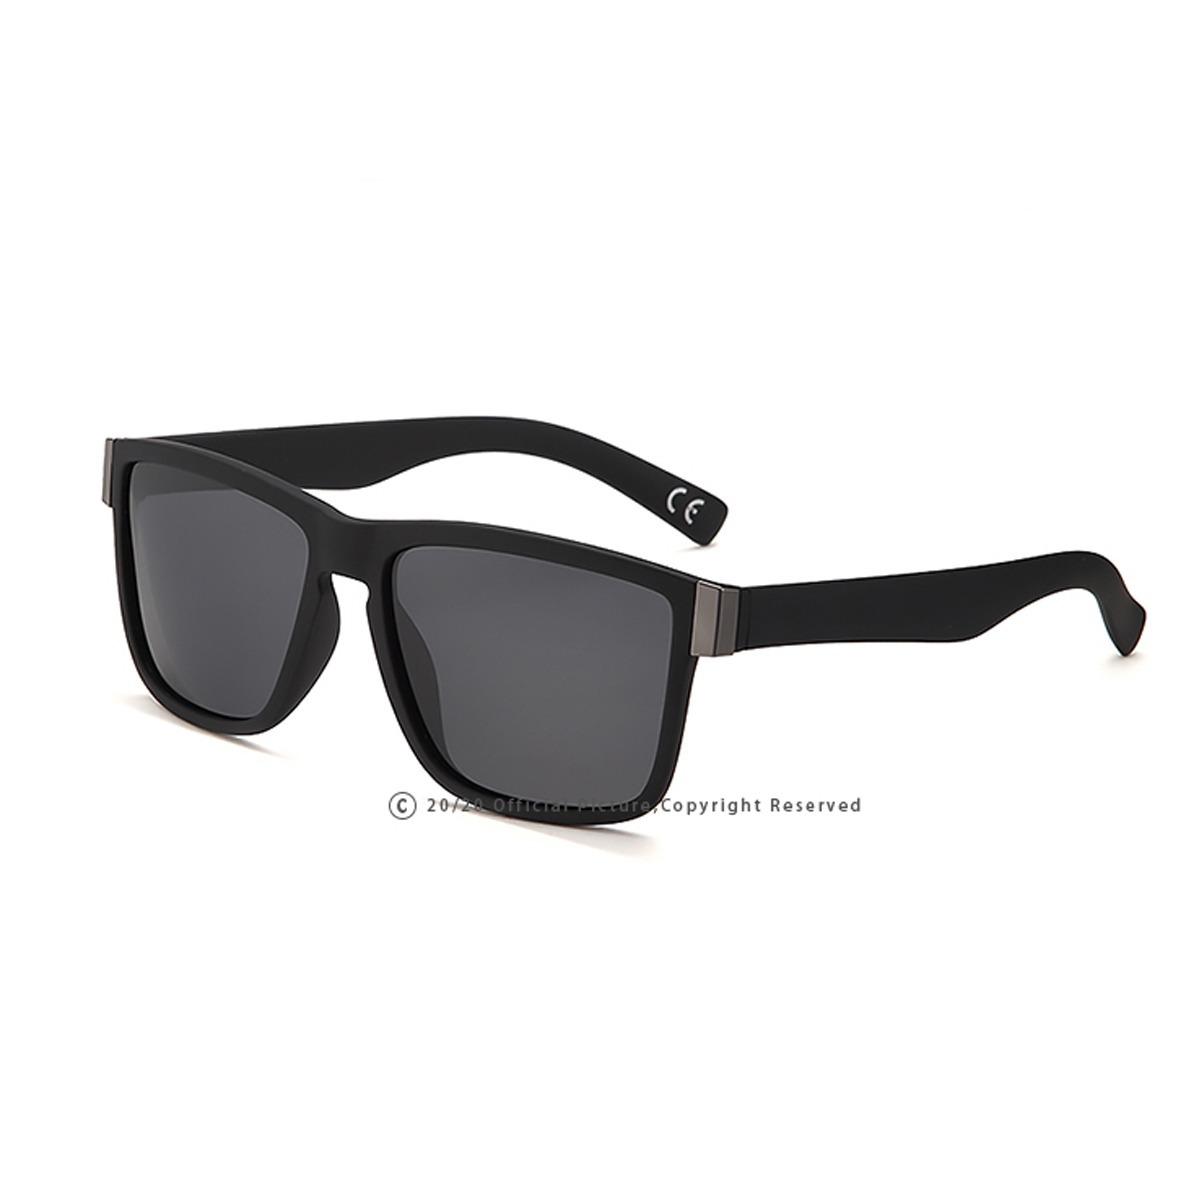 dc04dee89afad oculos sol masculino original 2020. Carregando zoom.